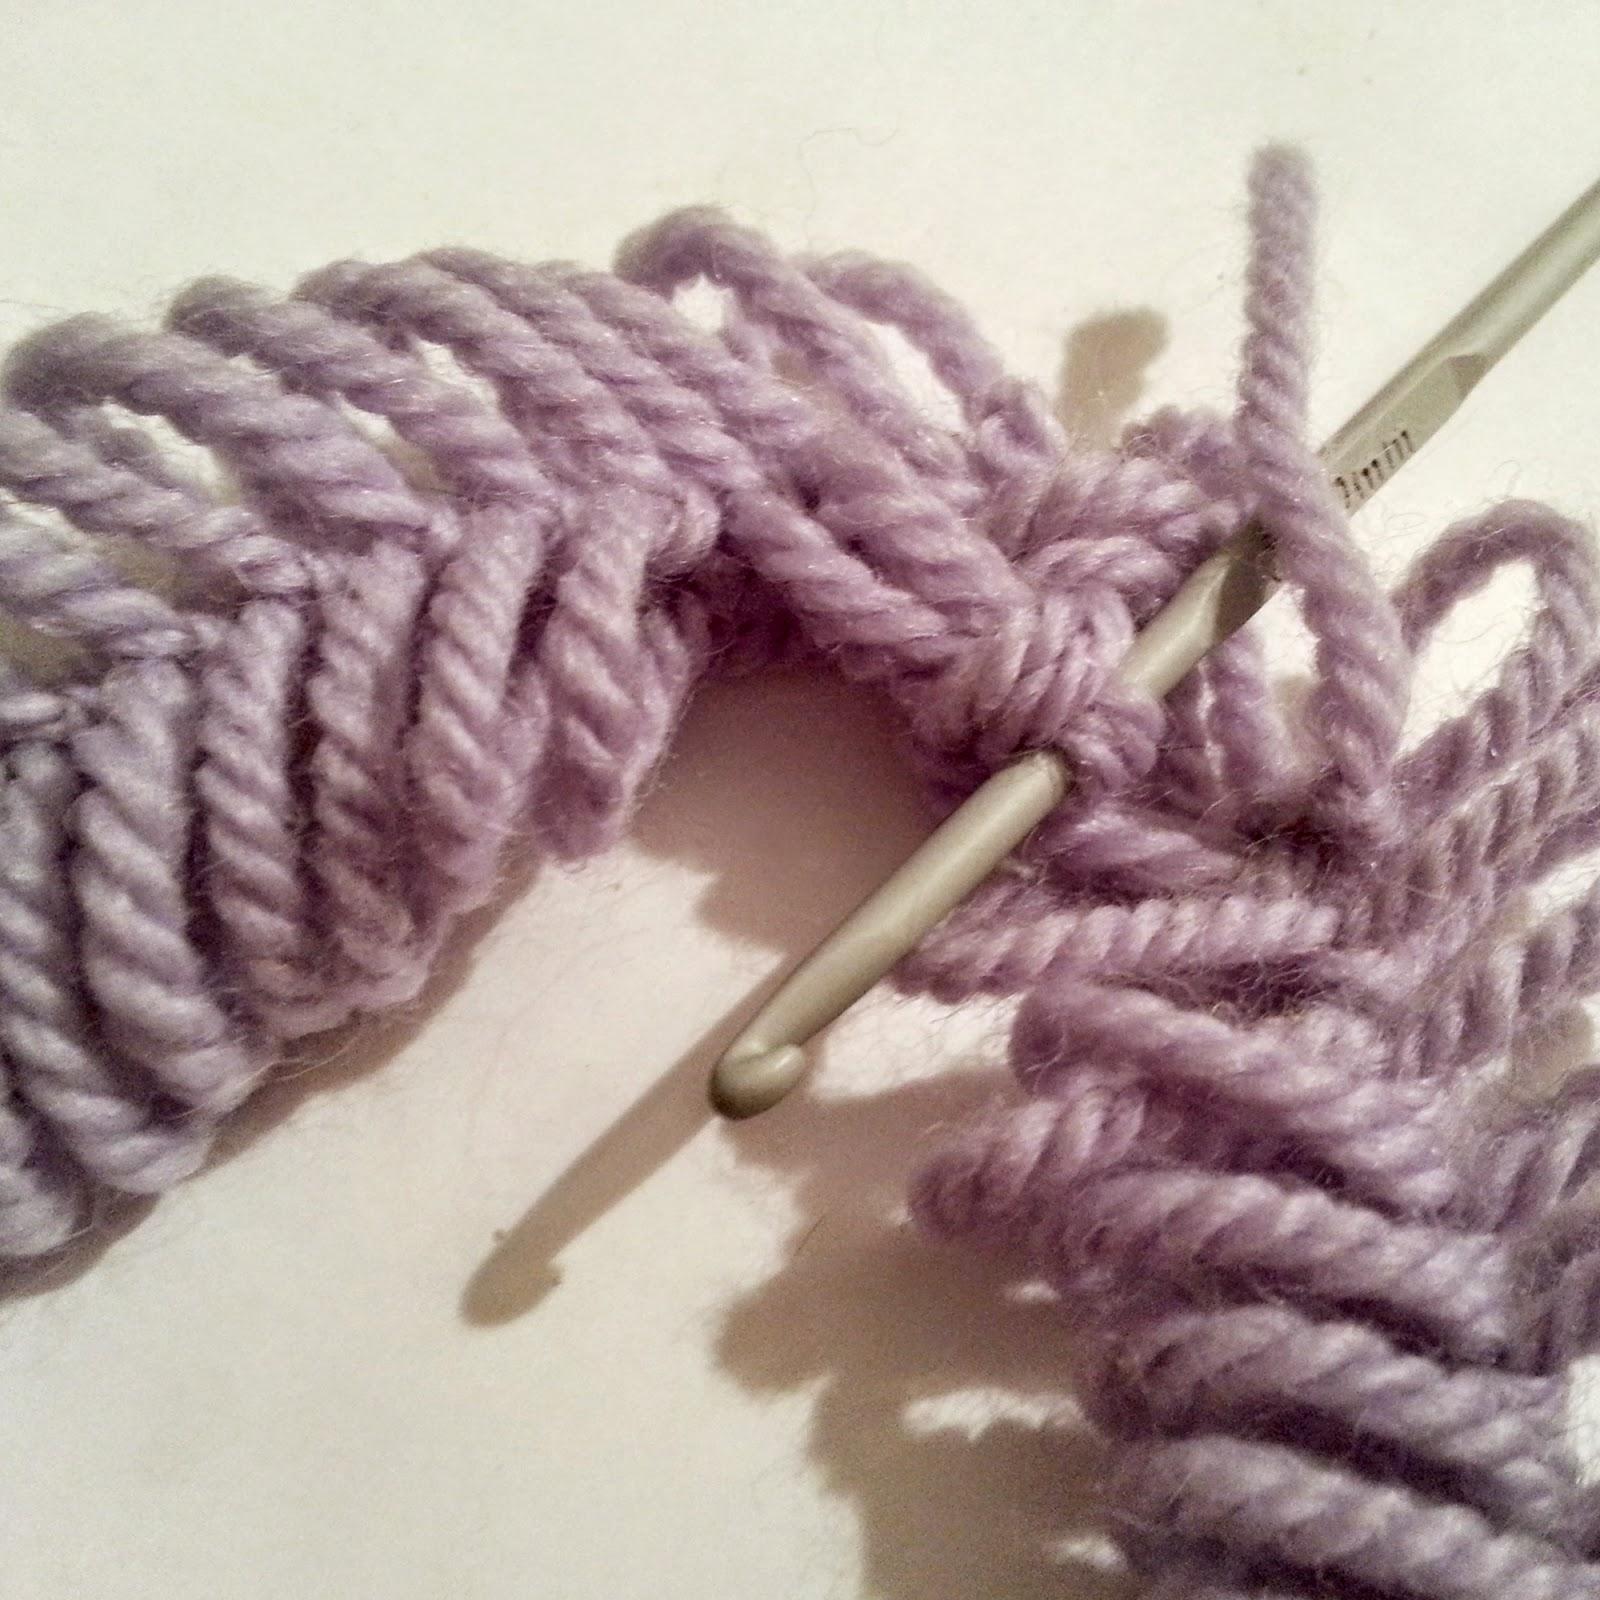 Другие виды рукоделия. Вязание на вилке 53